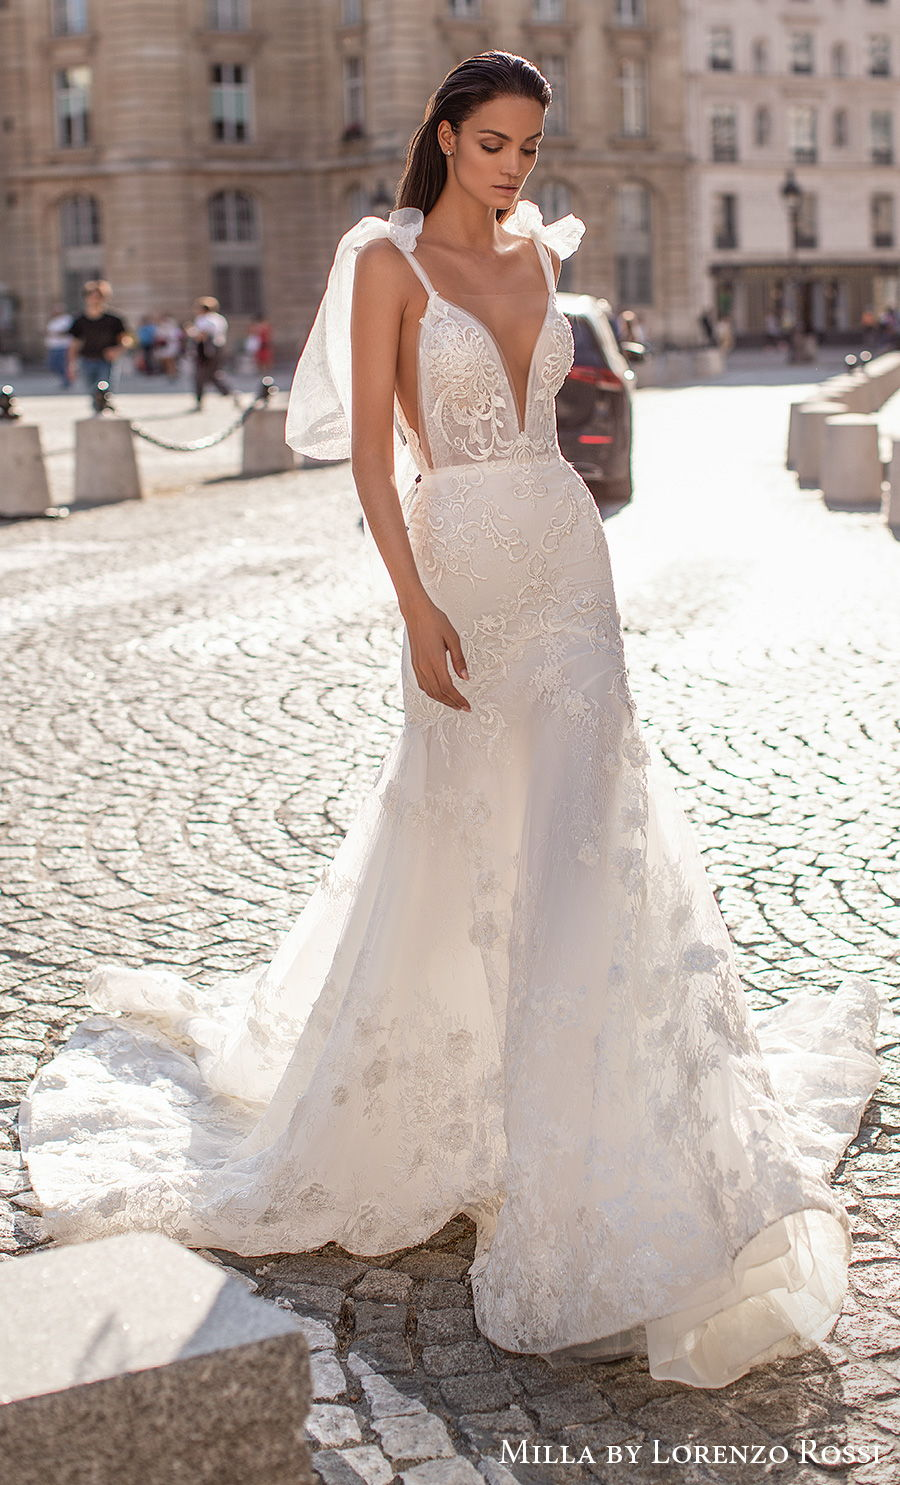 milla lorenzo rossi 2021 bridal sleeveless ribbon strap deep plunging v neck full embellishment sexy romantic mermaid wedding dress backless mermaid wedding dress royal train (fernada) mv